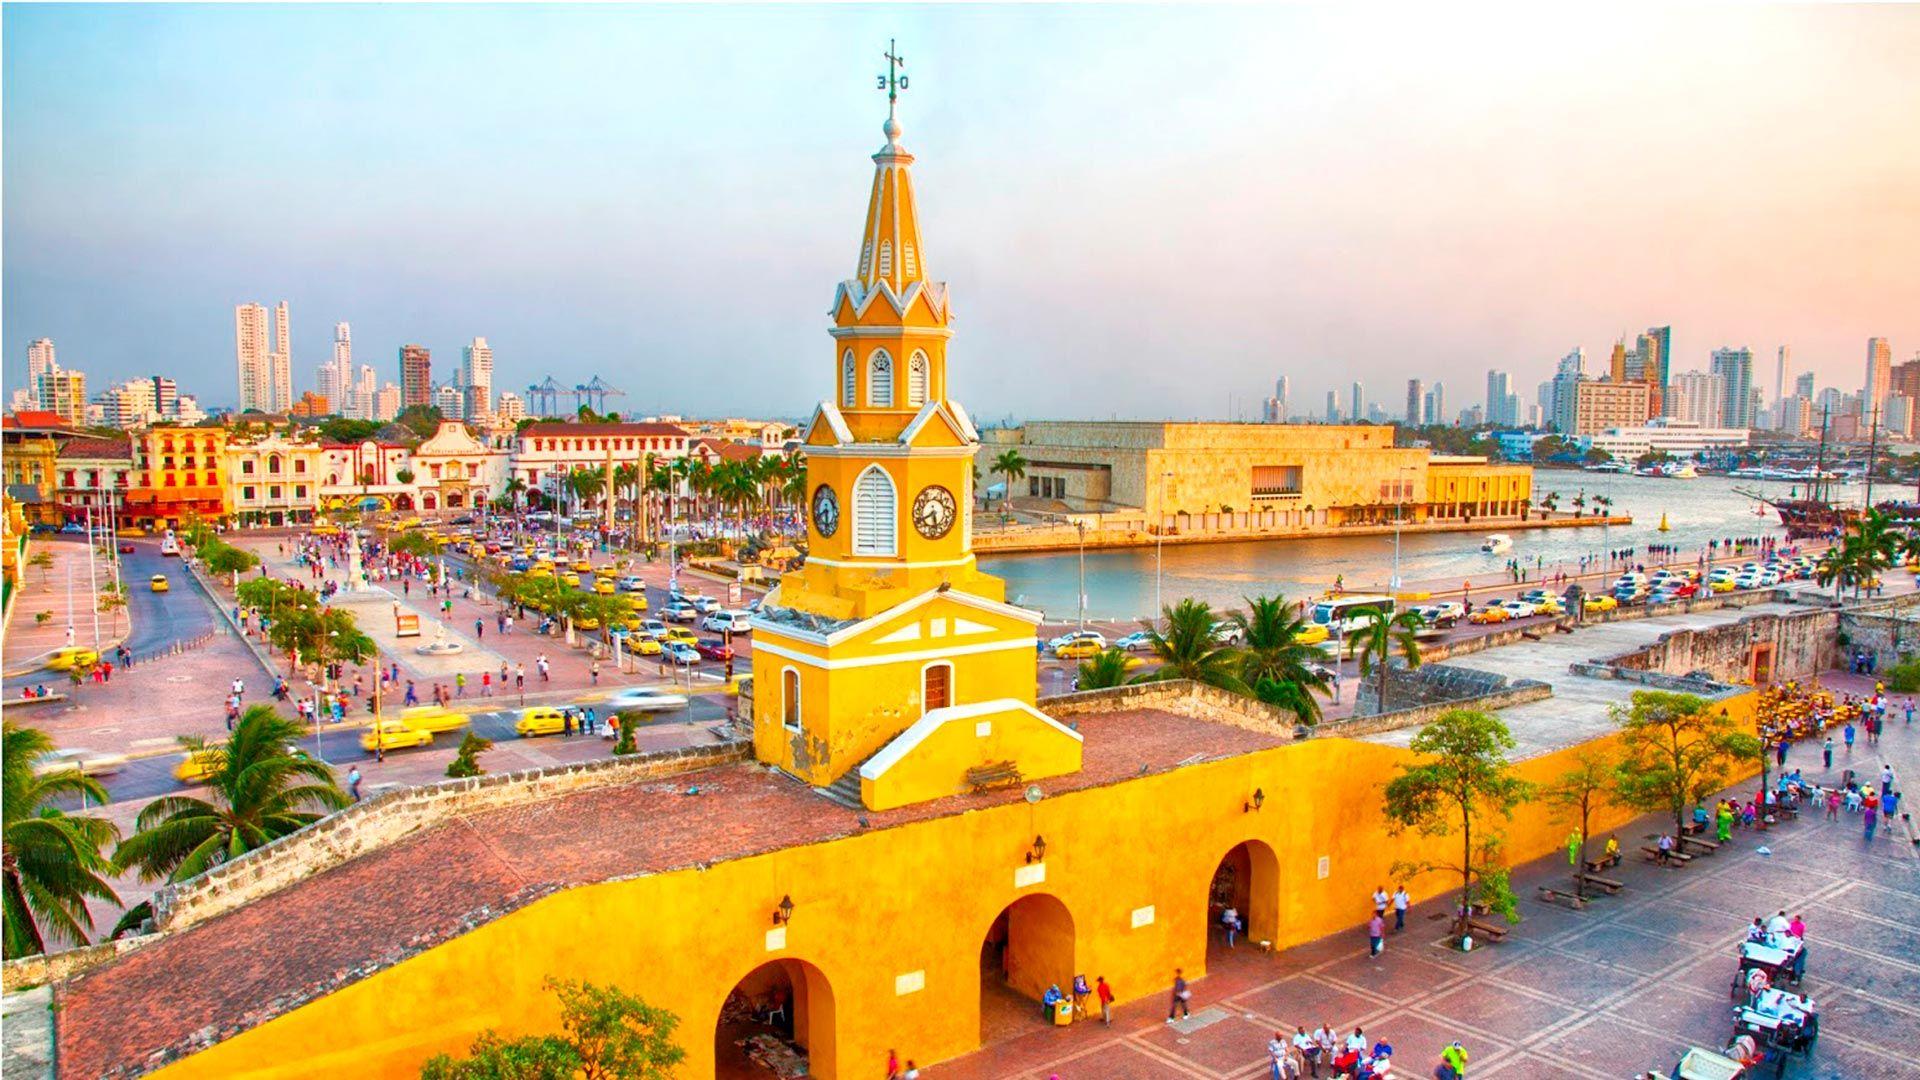 Pin De Cartagena Service Em Cartagena Service O Turista Cartagena Cartagena De Indias